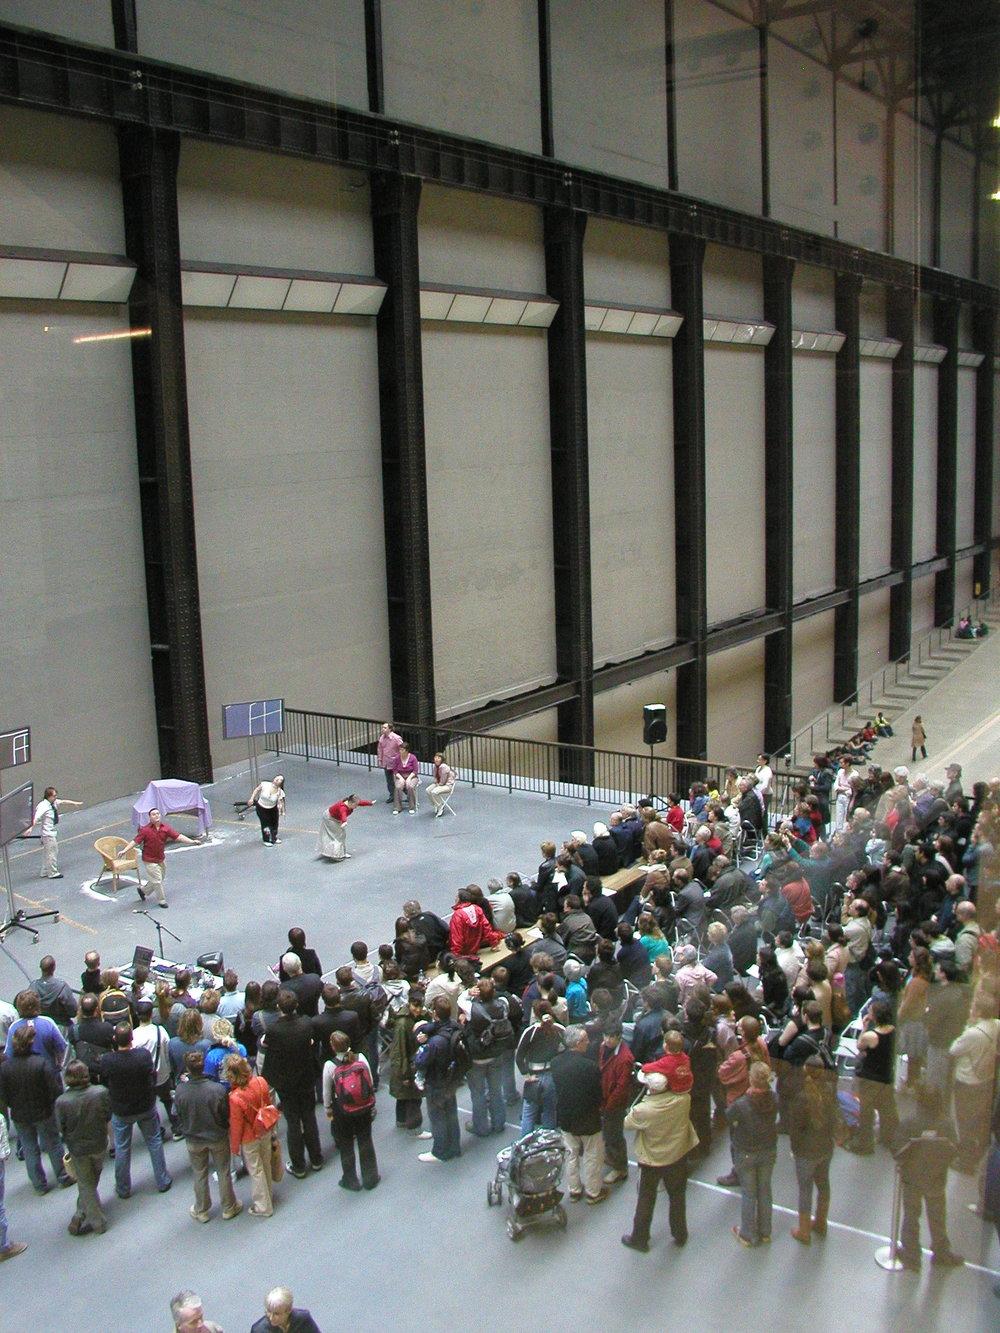 Kissed (2005) - Gantry Bridge, Tate Modern; Bonnie Bird Theatre, Trinity Laban